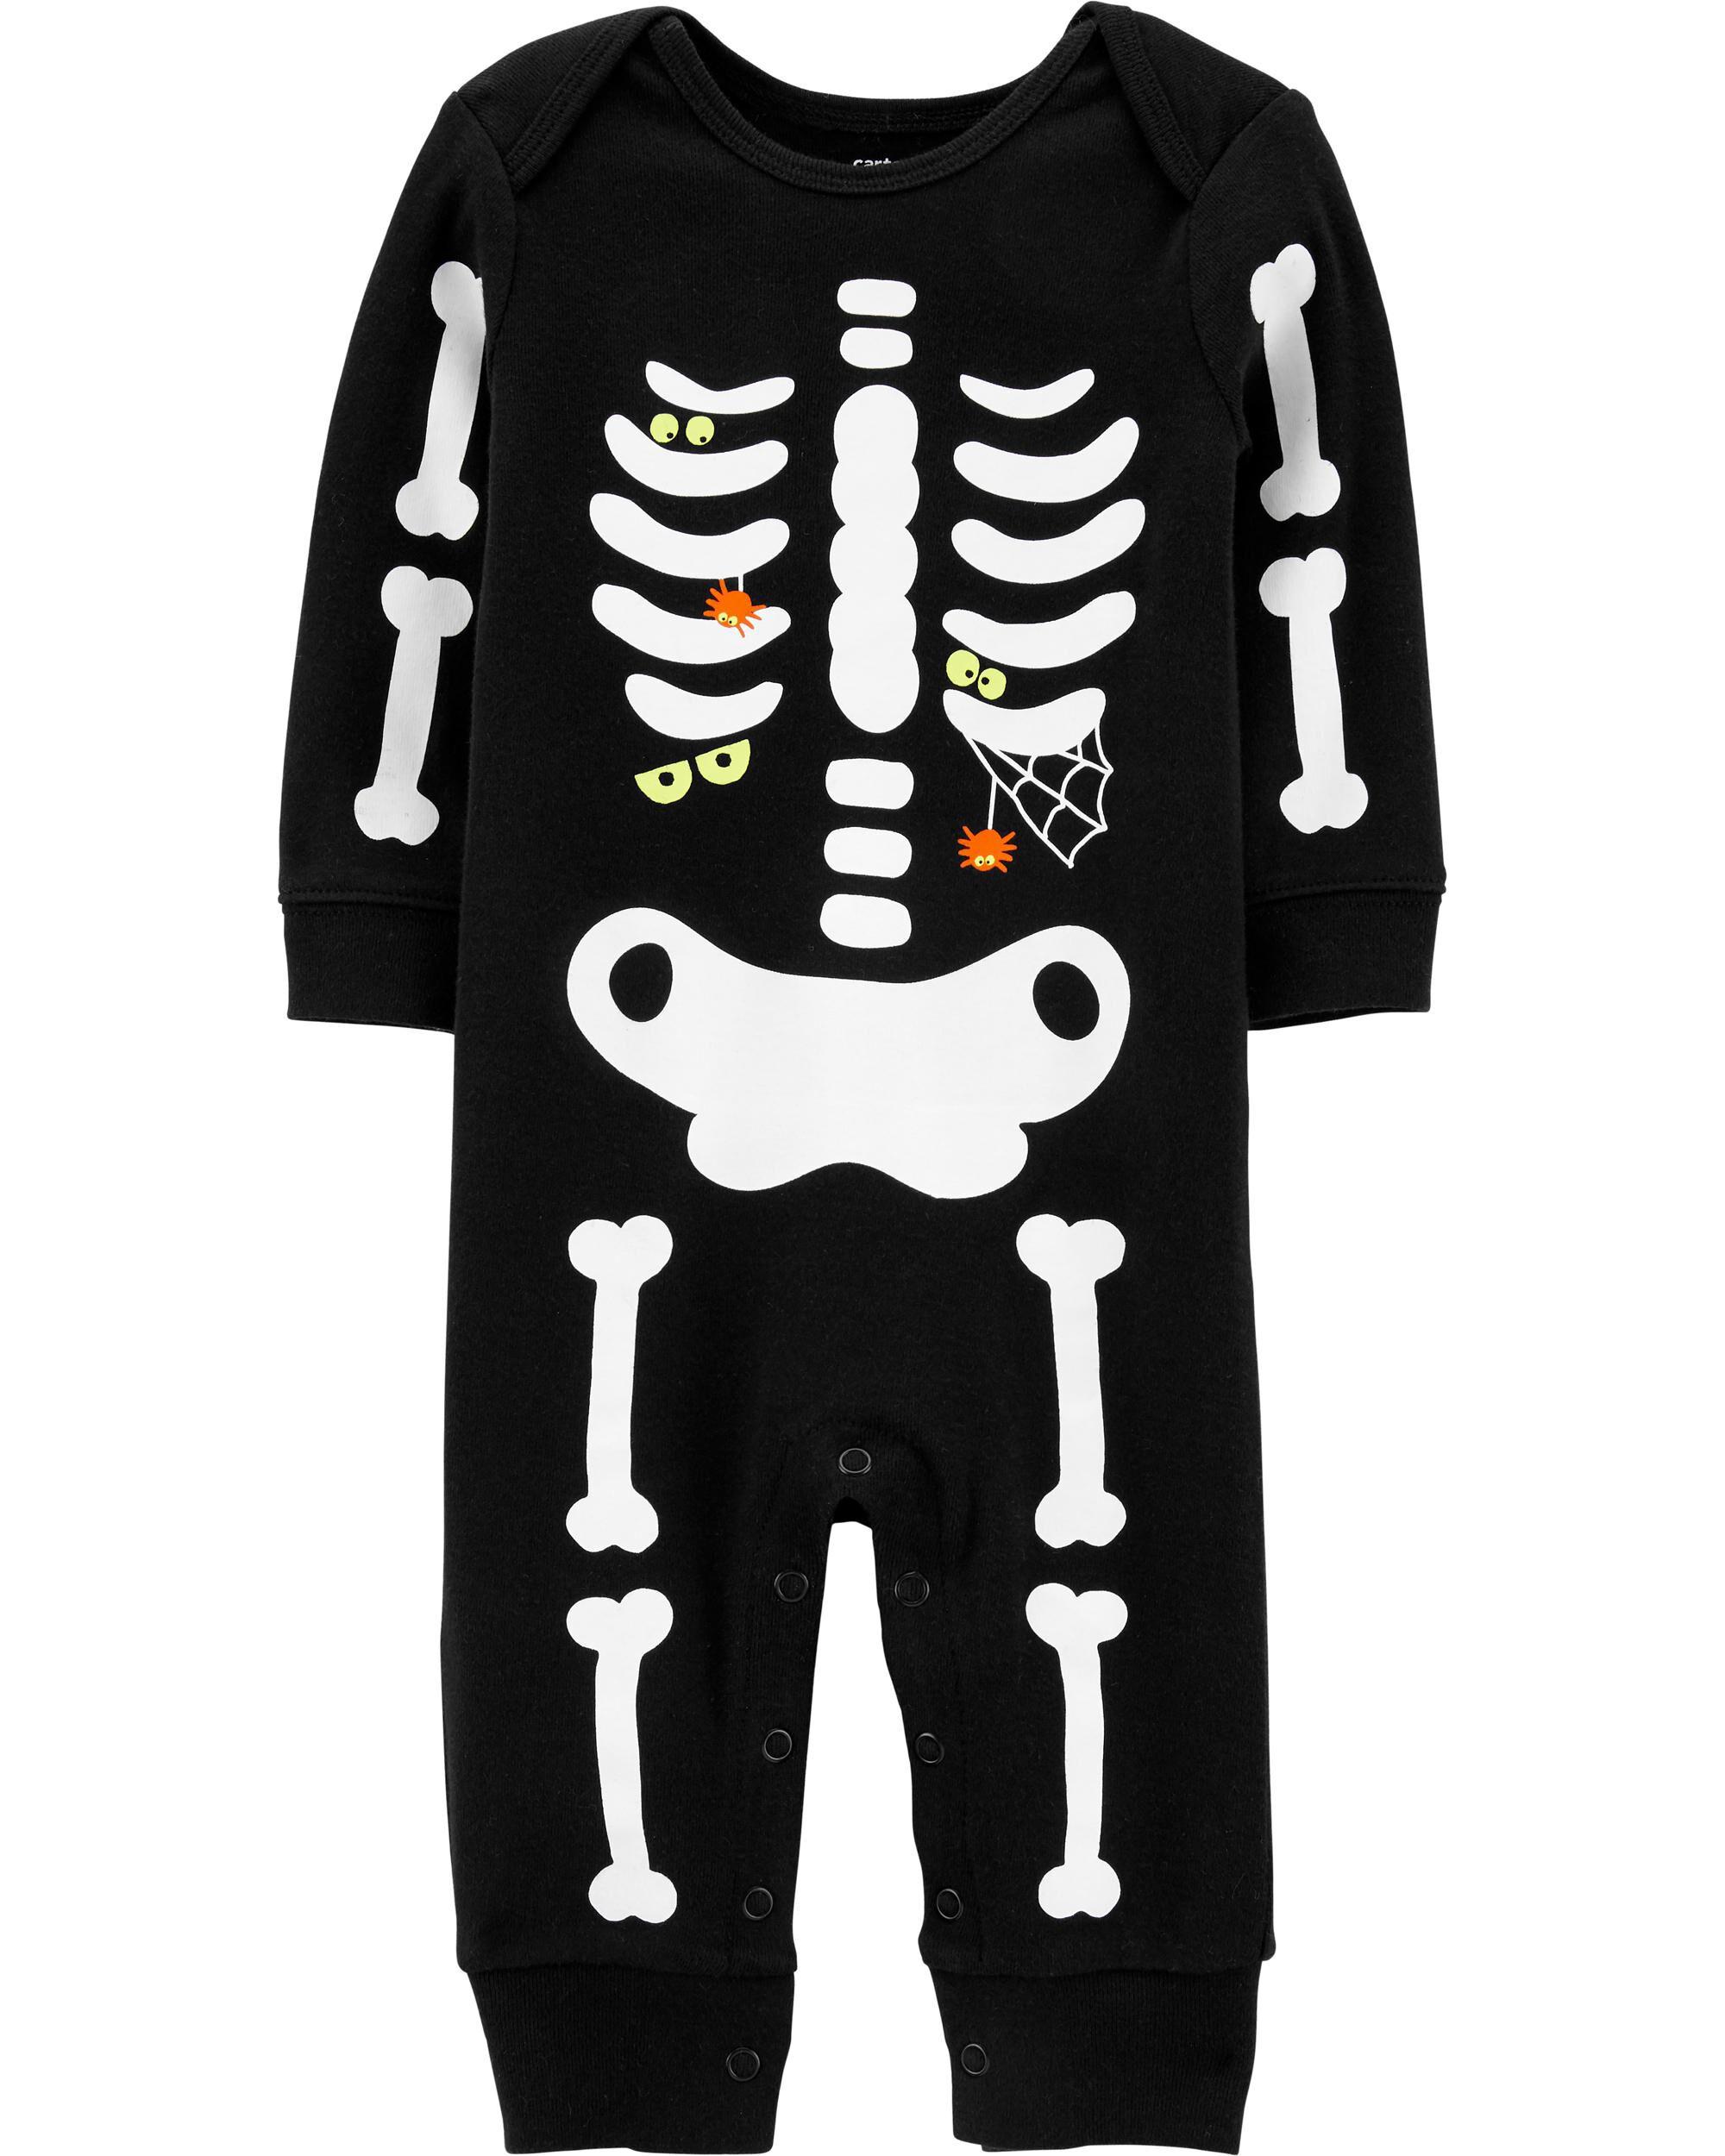 Carters Glow Halloween Skeleton Jumpsuit